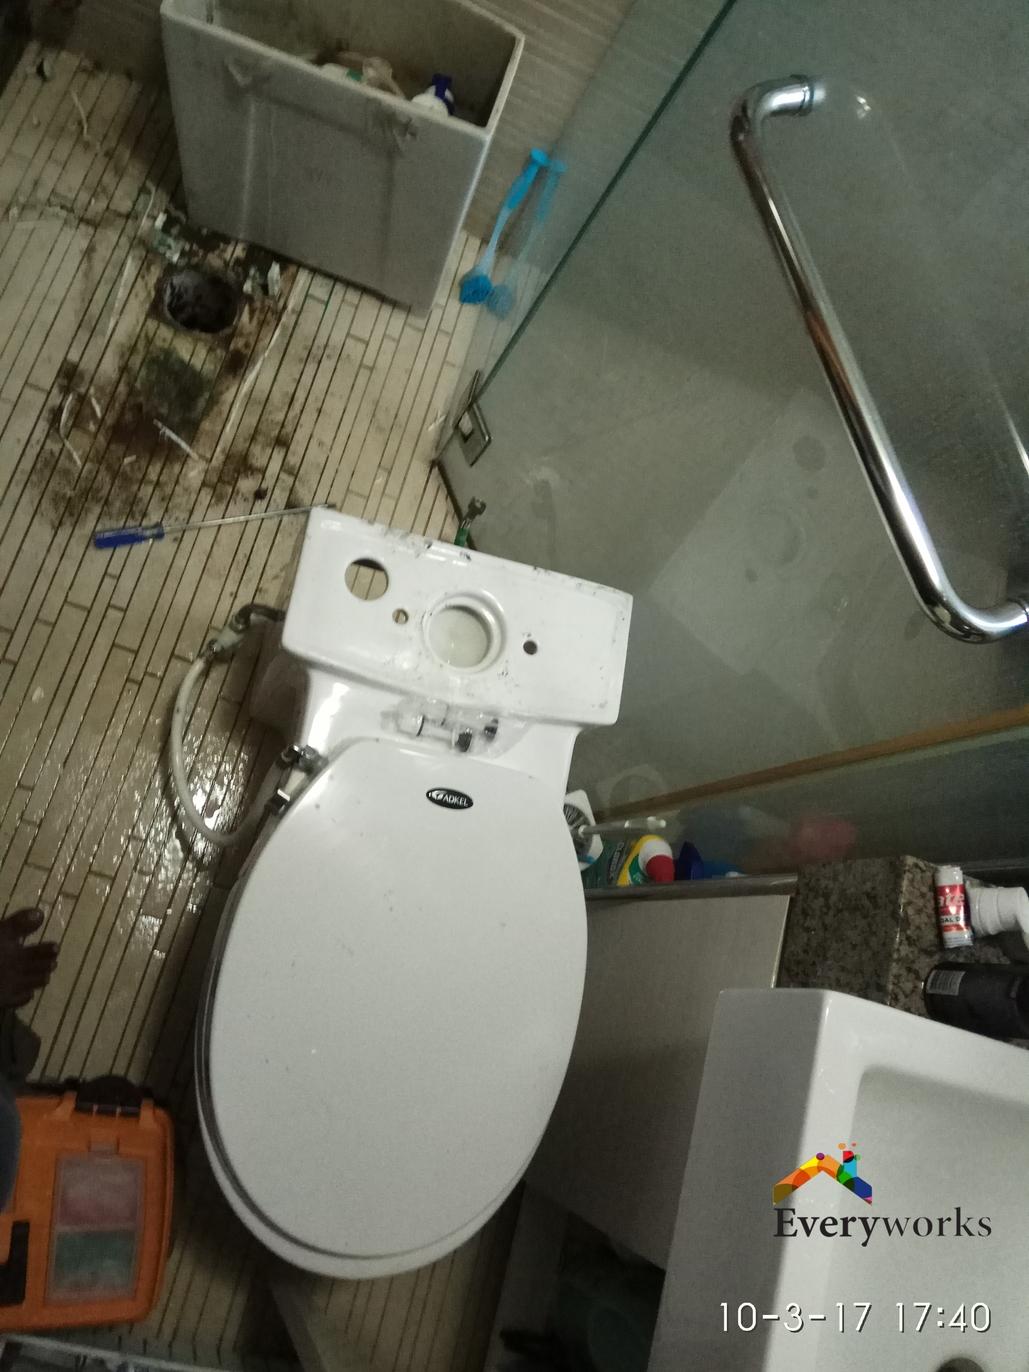 Clear-Toilet-Bowl-Choke-Drainage-Pipe-Choke-Plumber-Singapore-Landed-Sembawang-4_wm